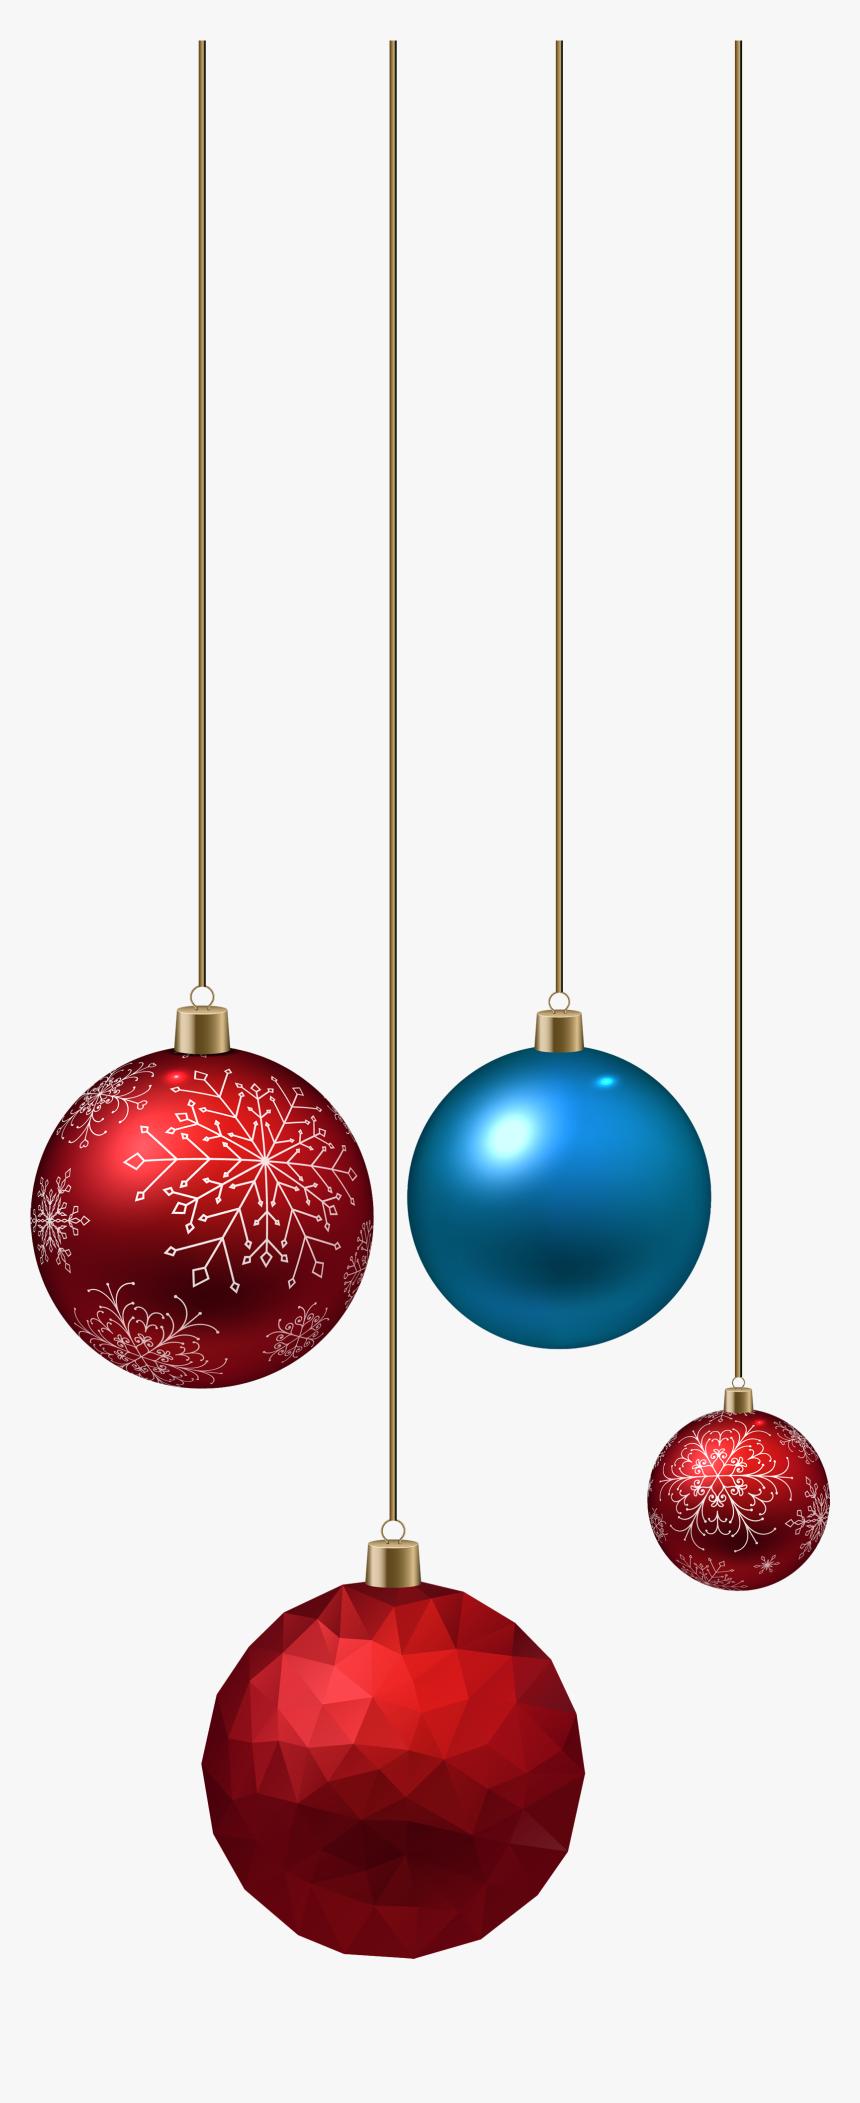 Png Christmas Balls Transparent - Png Format Christmas Ball Png, Png Download, Free Download